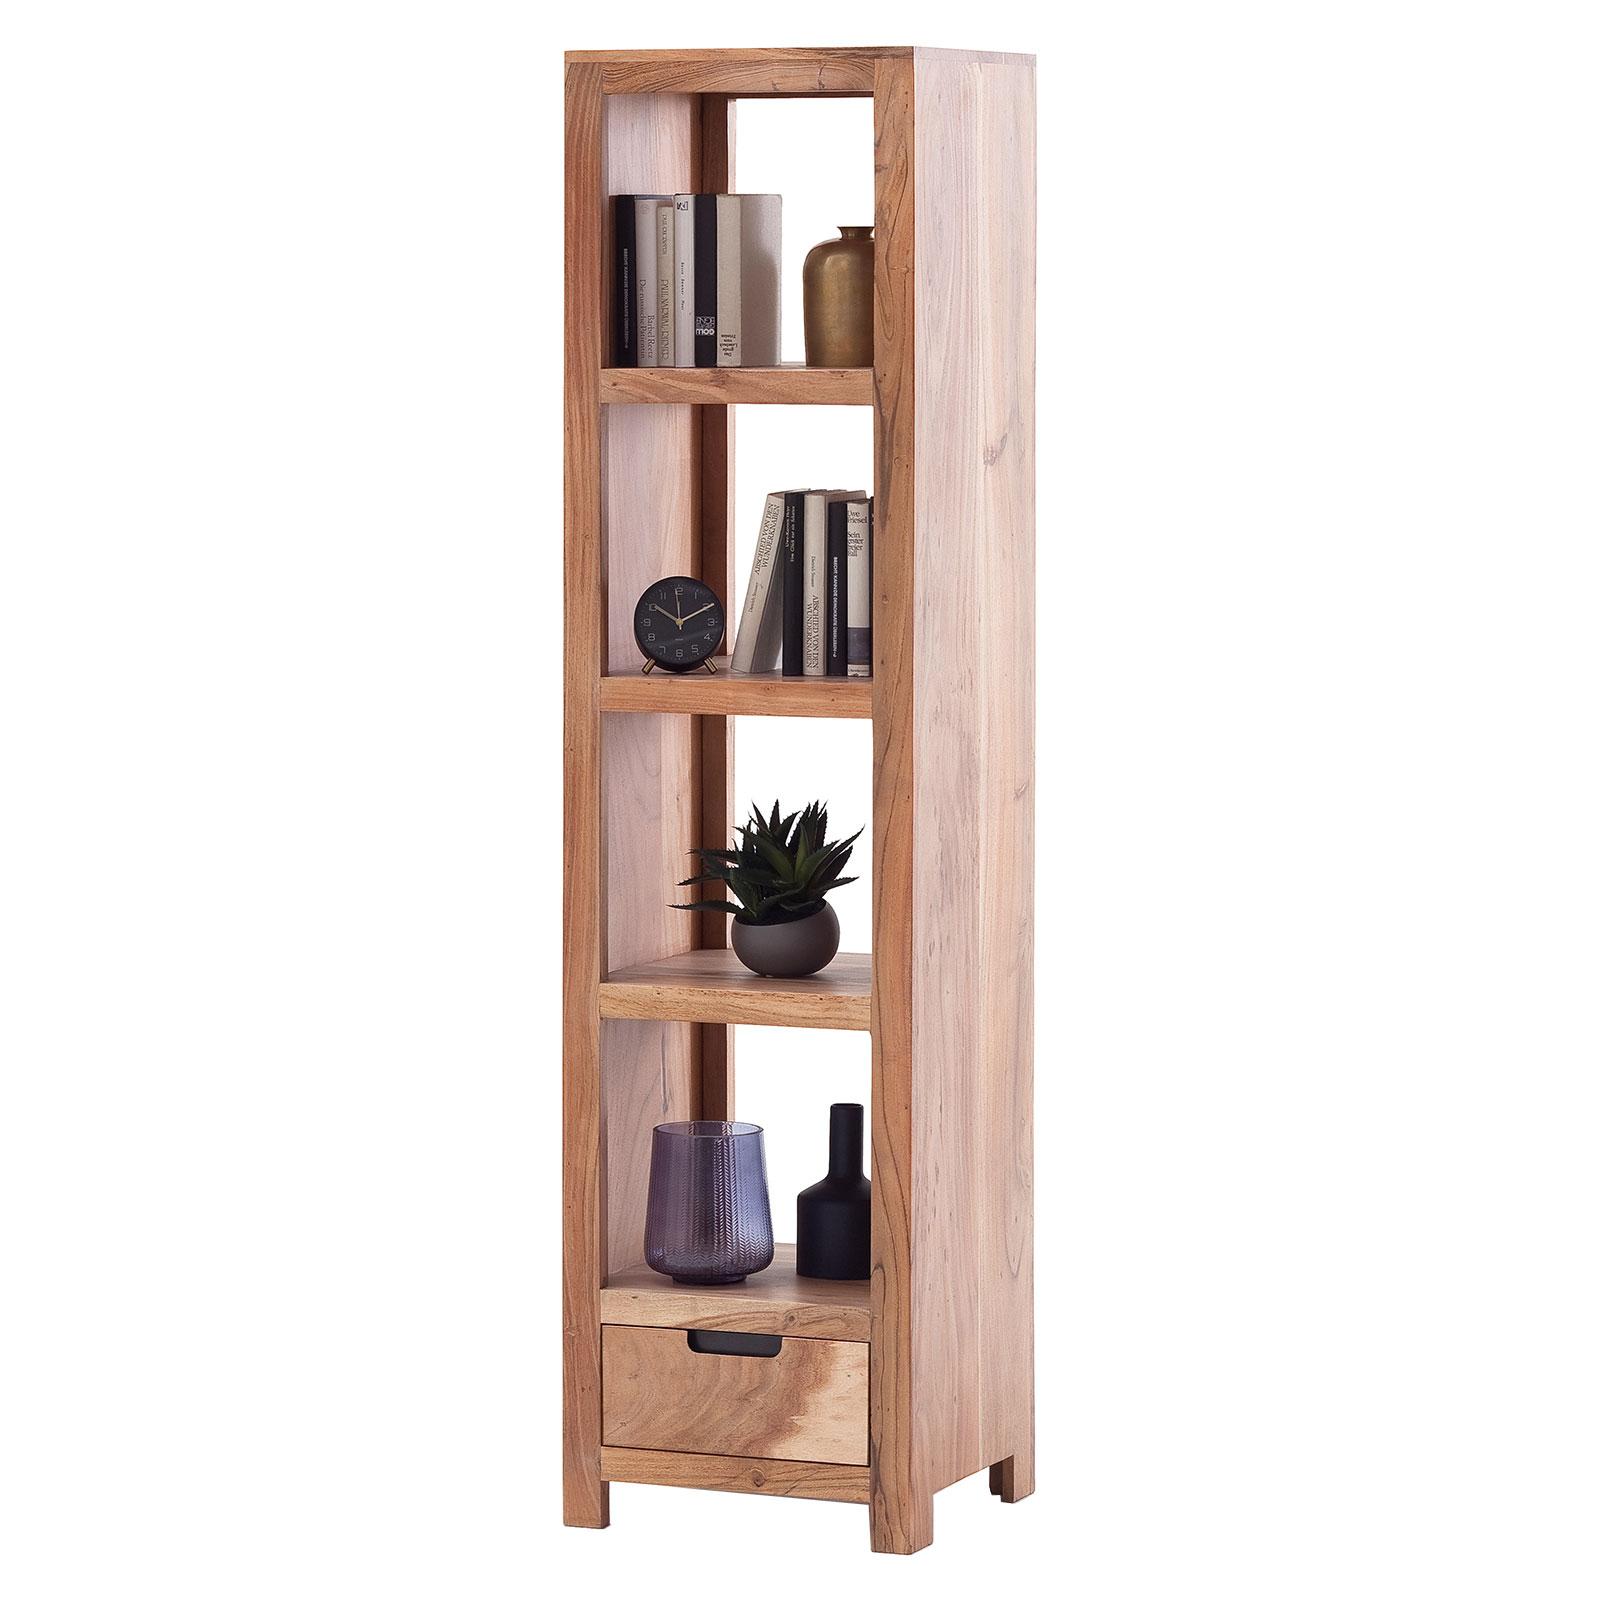 Bücherregal Ilow aus Akazie Massivholz in Natur lackiert - 45 x 178 cm